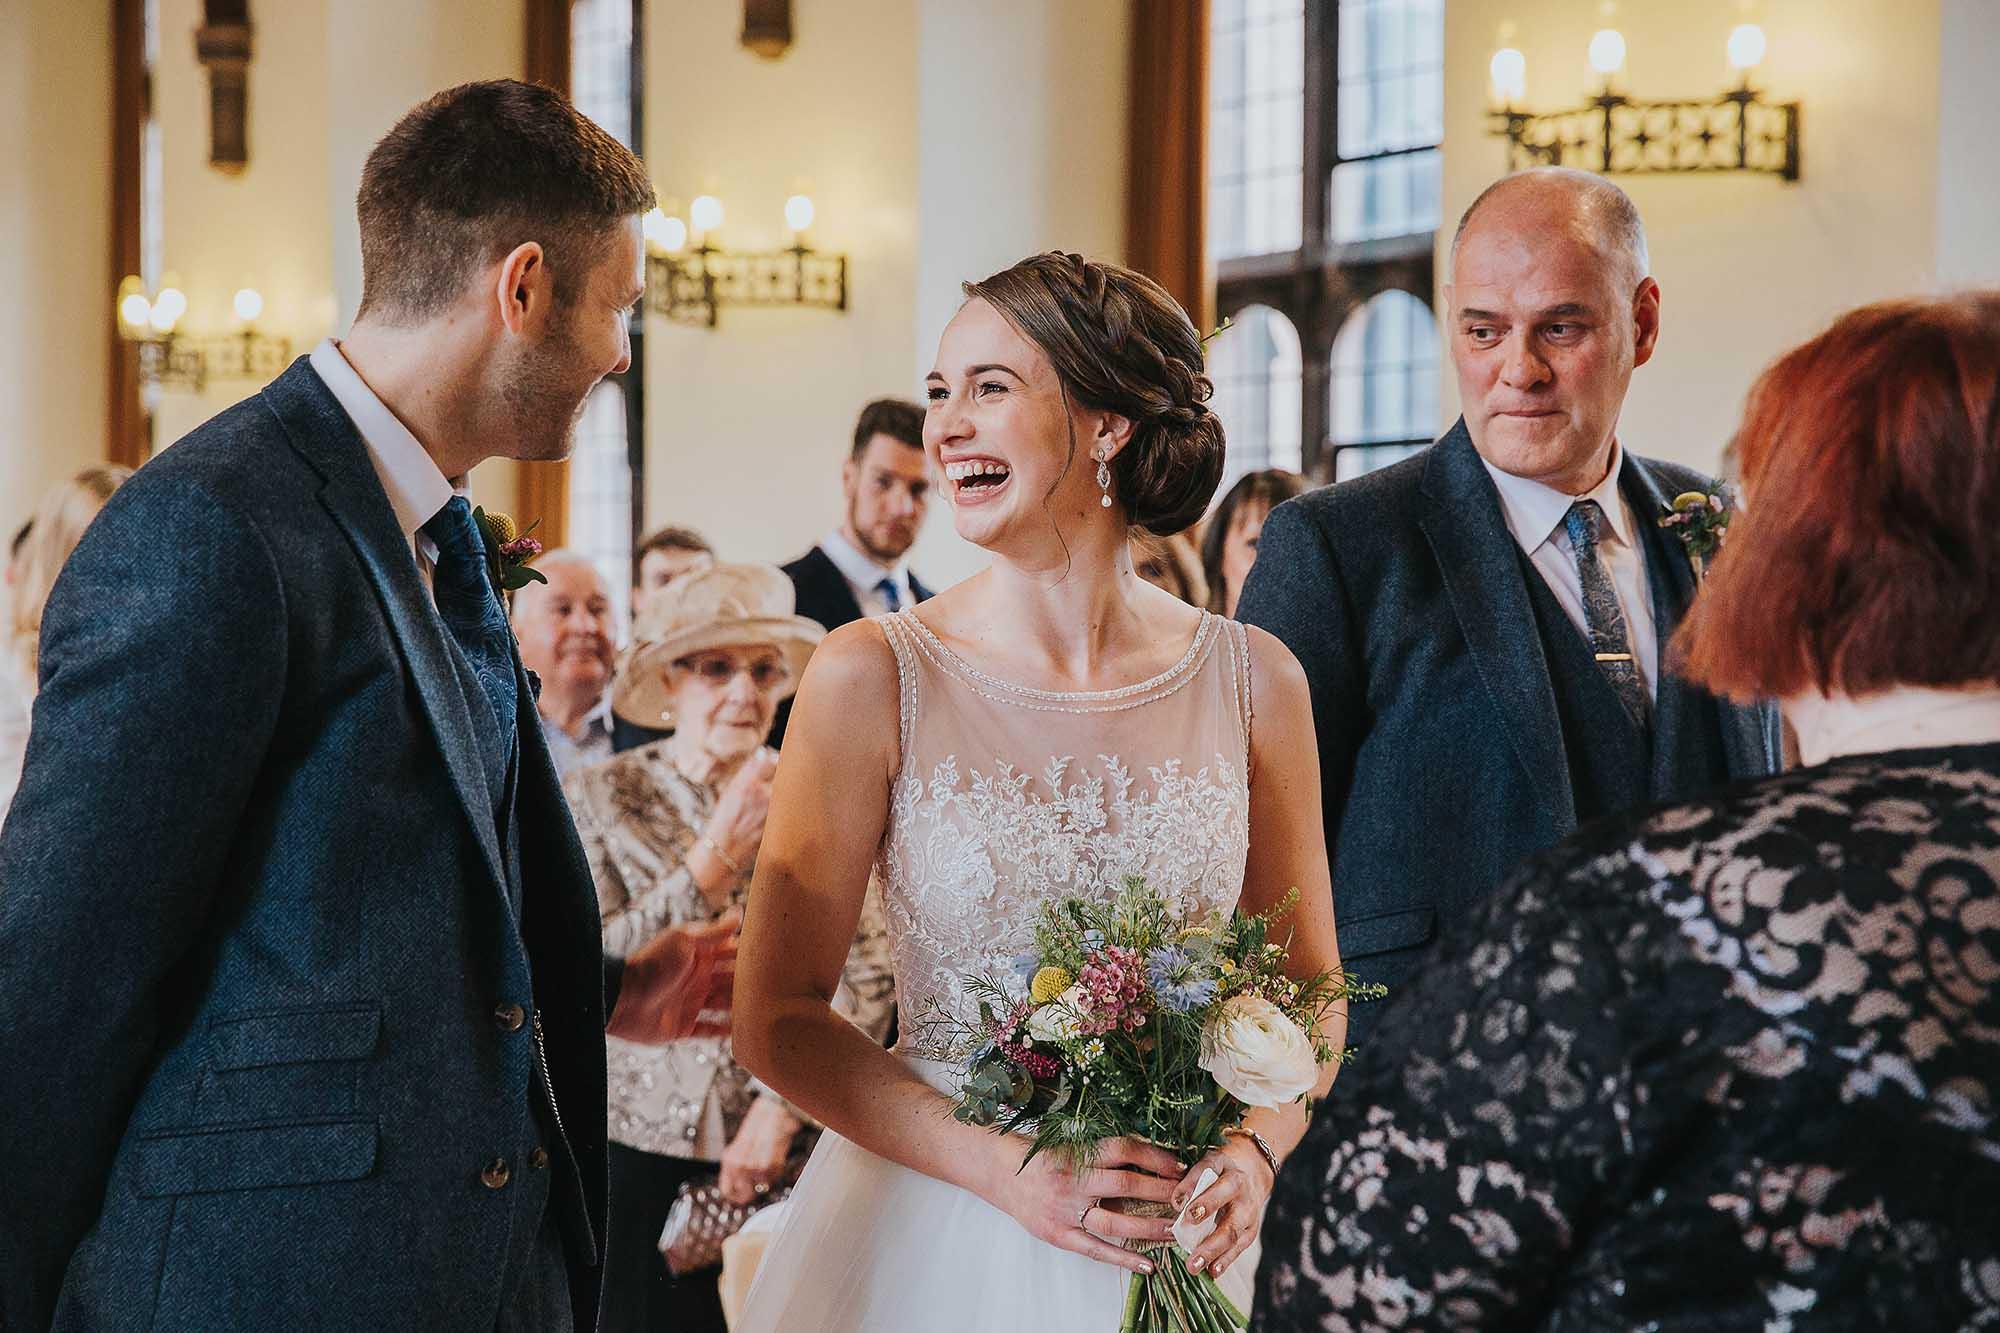 weddings at Bolton School hall